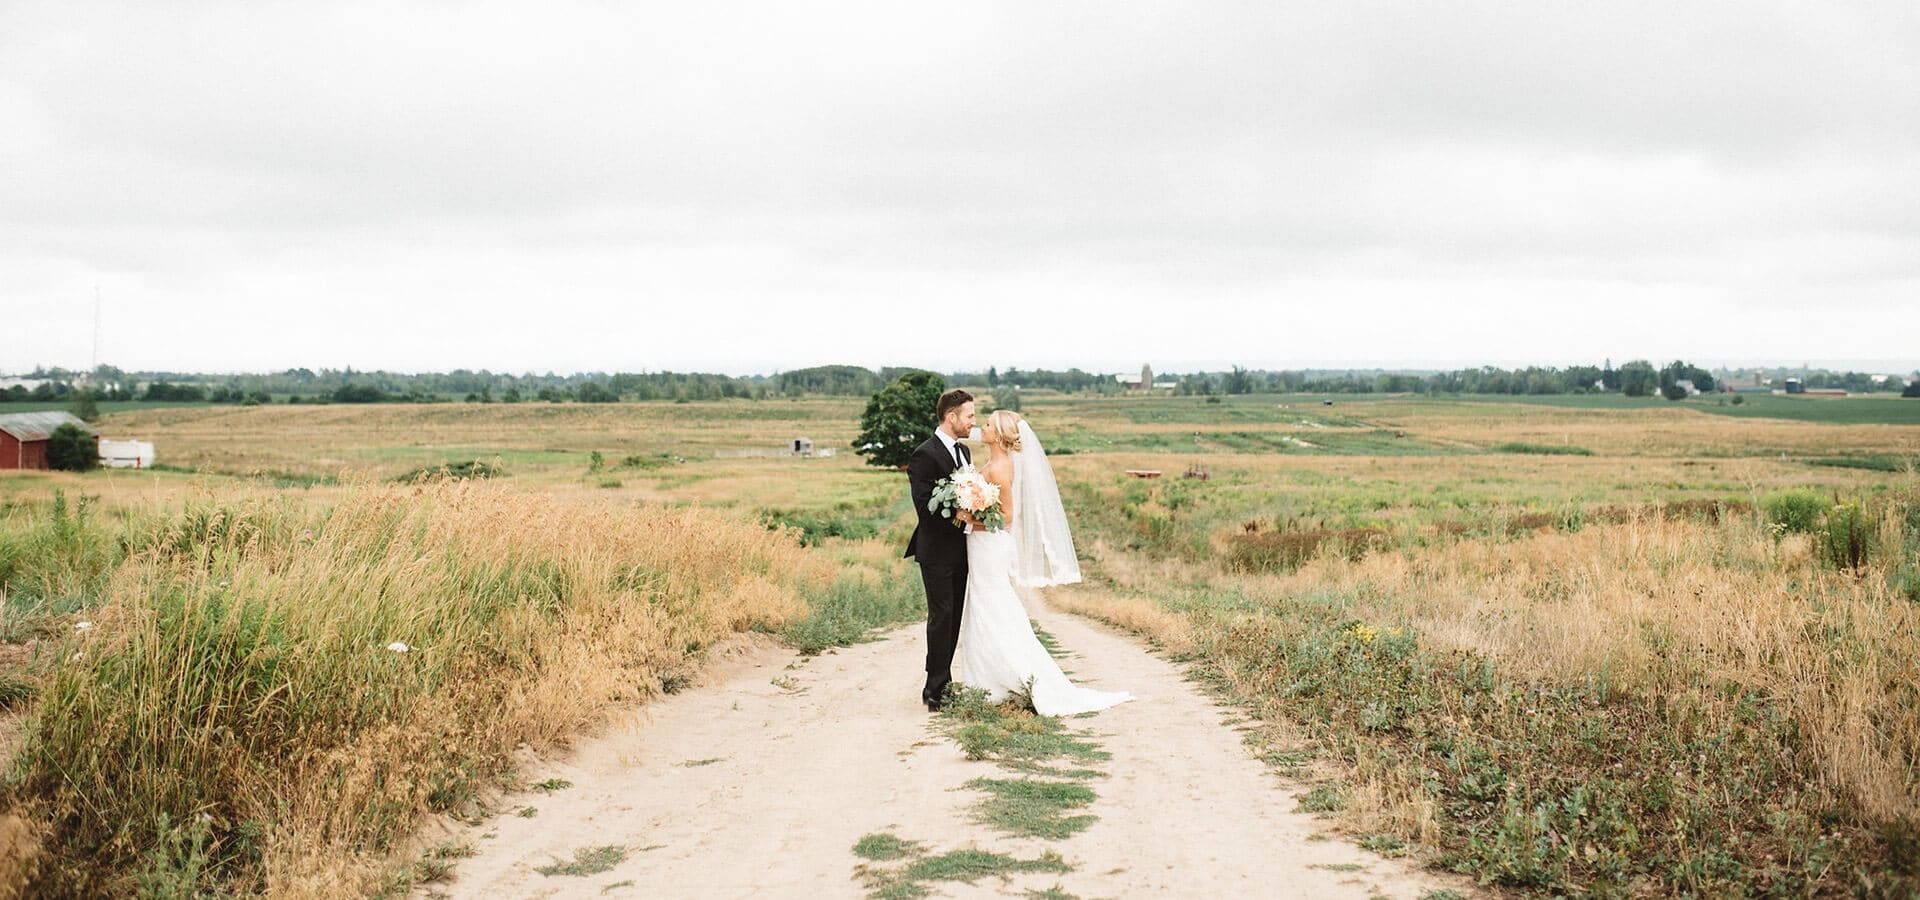 Hero image for Caitlin & Josh's Dreamy Barn Wedding at Earth To Table Farm